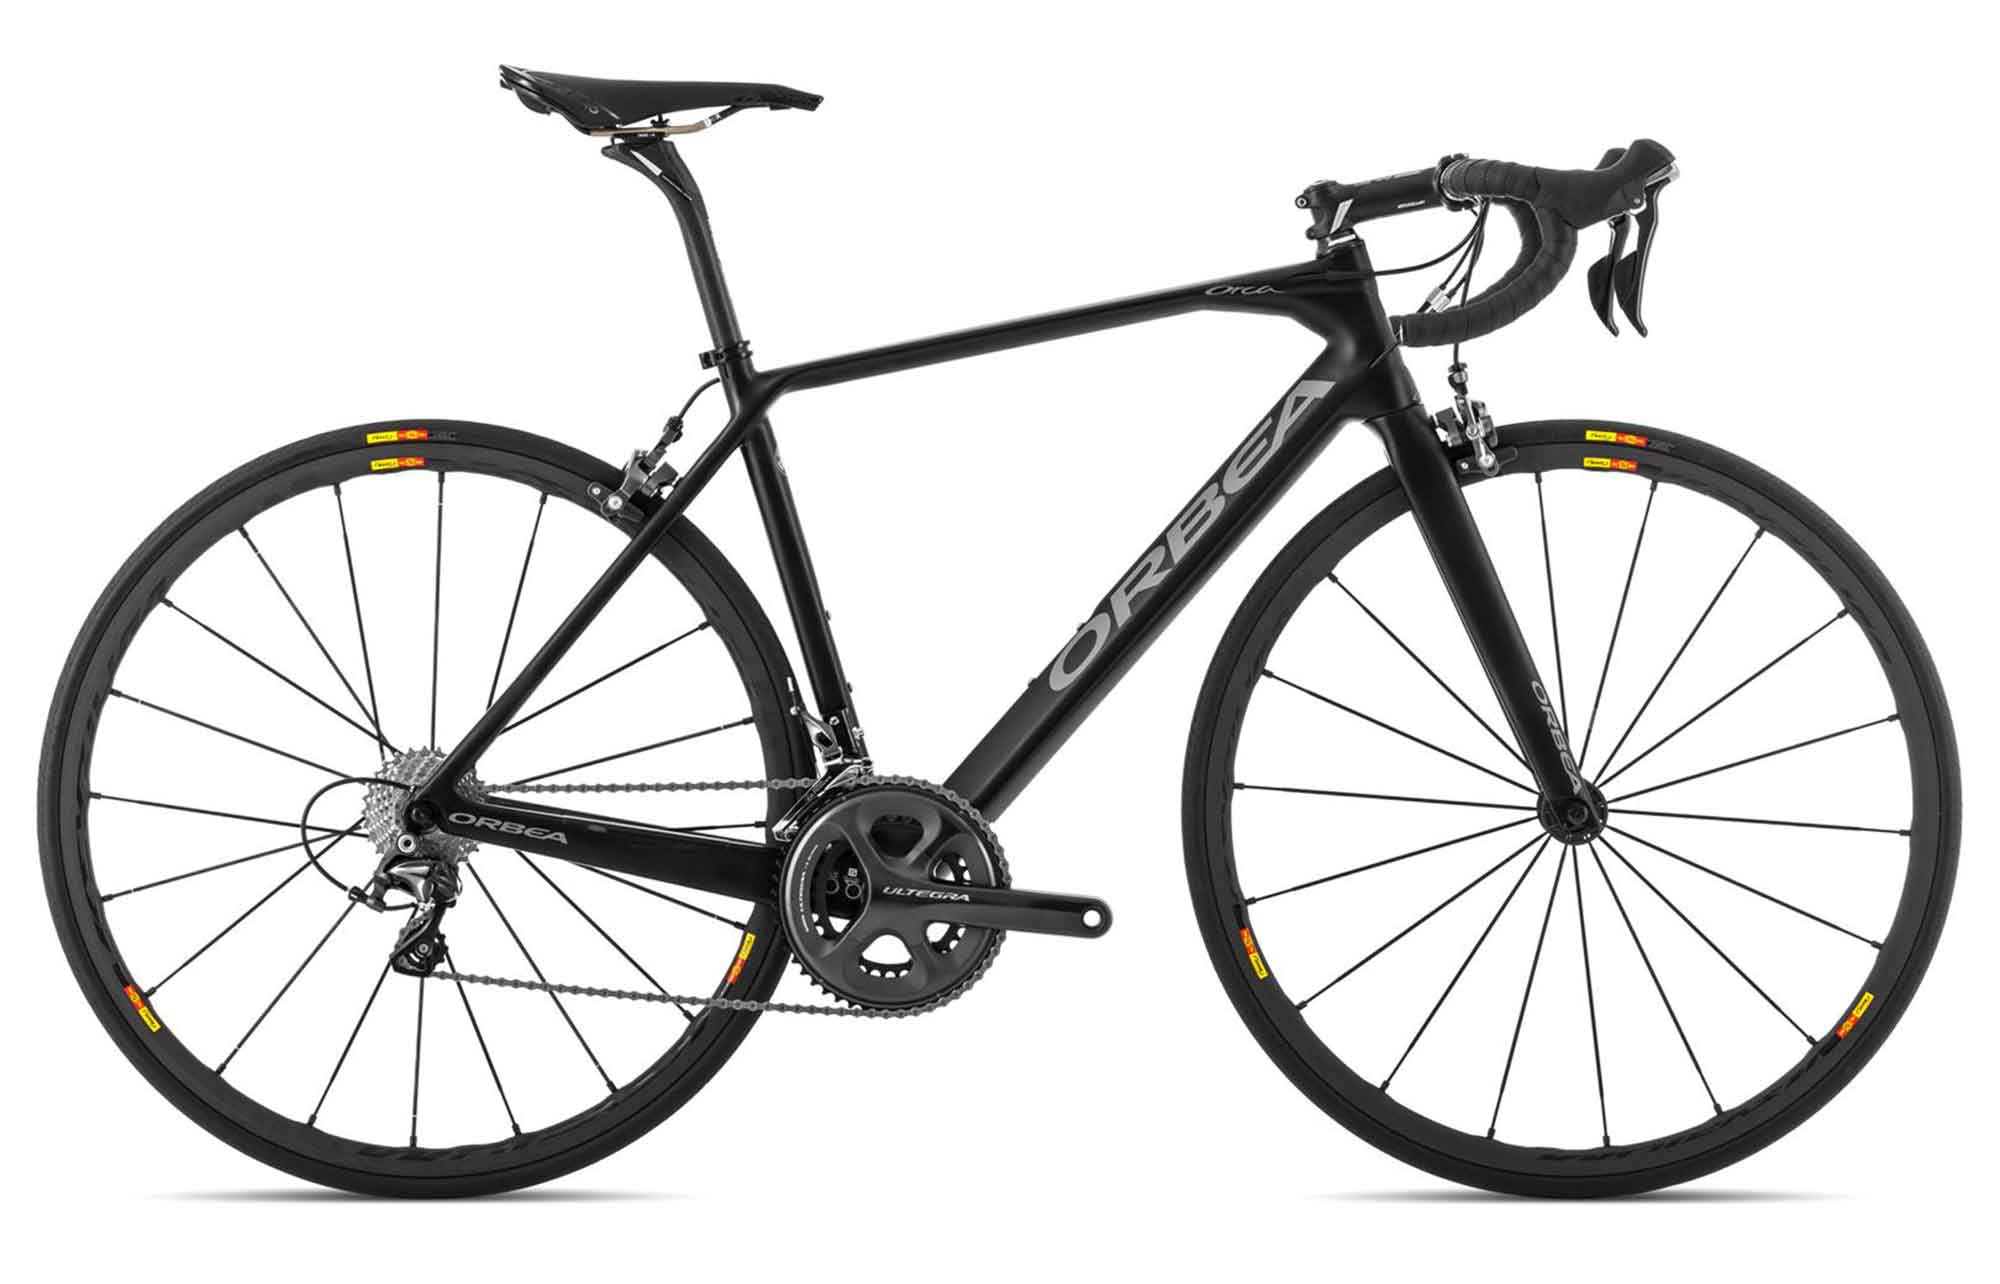 2015 Orbea Orca M11 Bike R Amp A Cycles